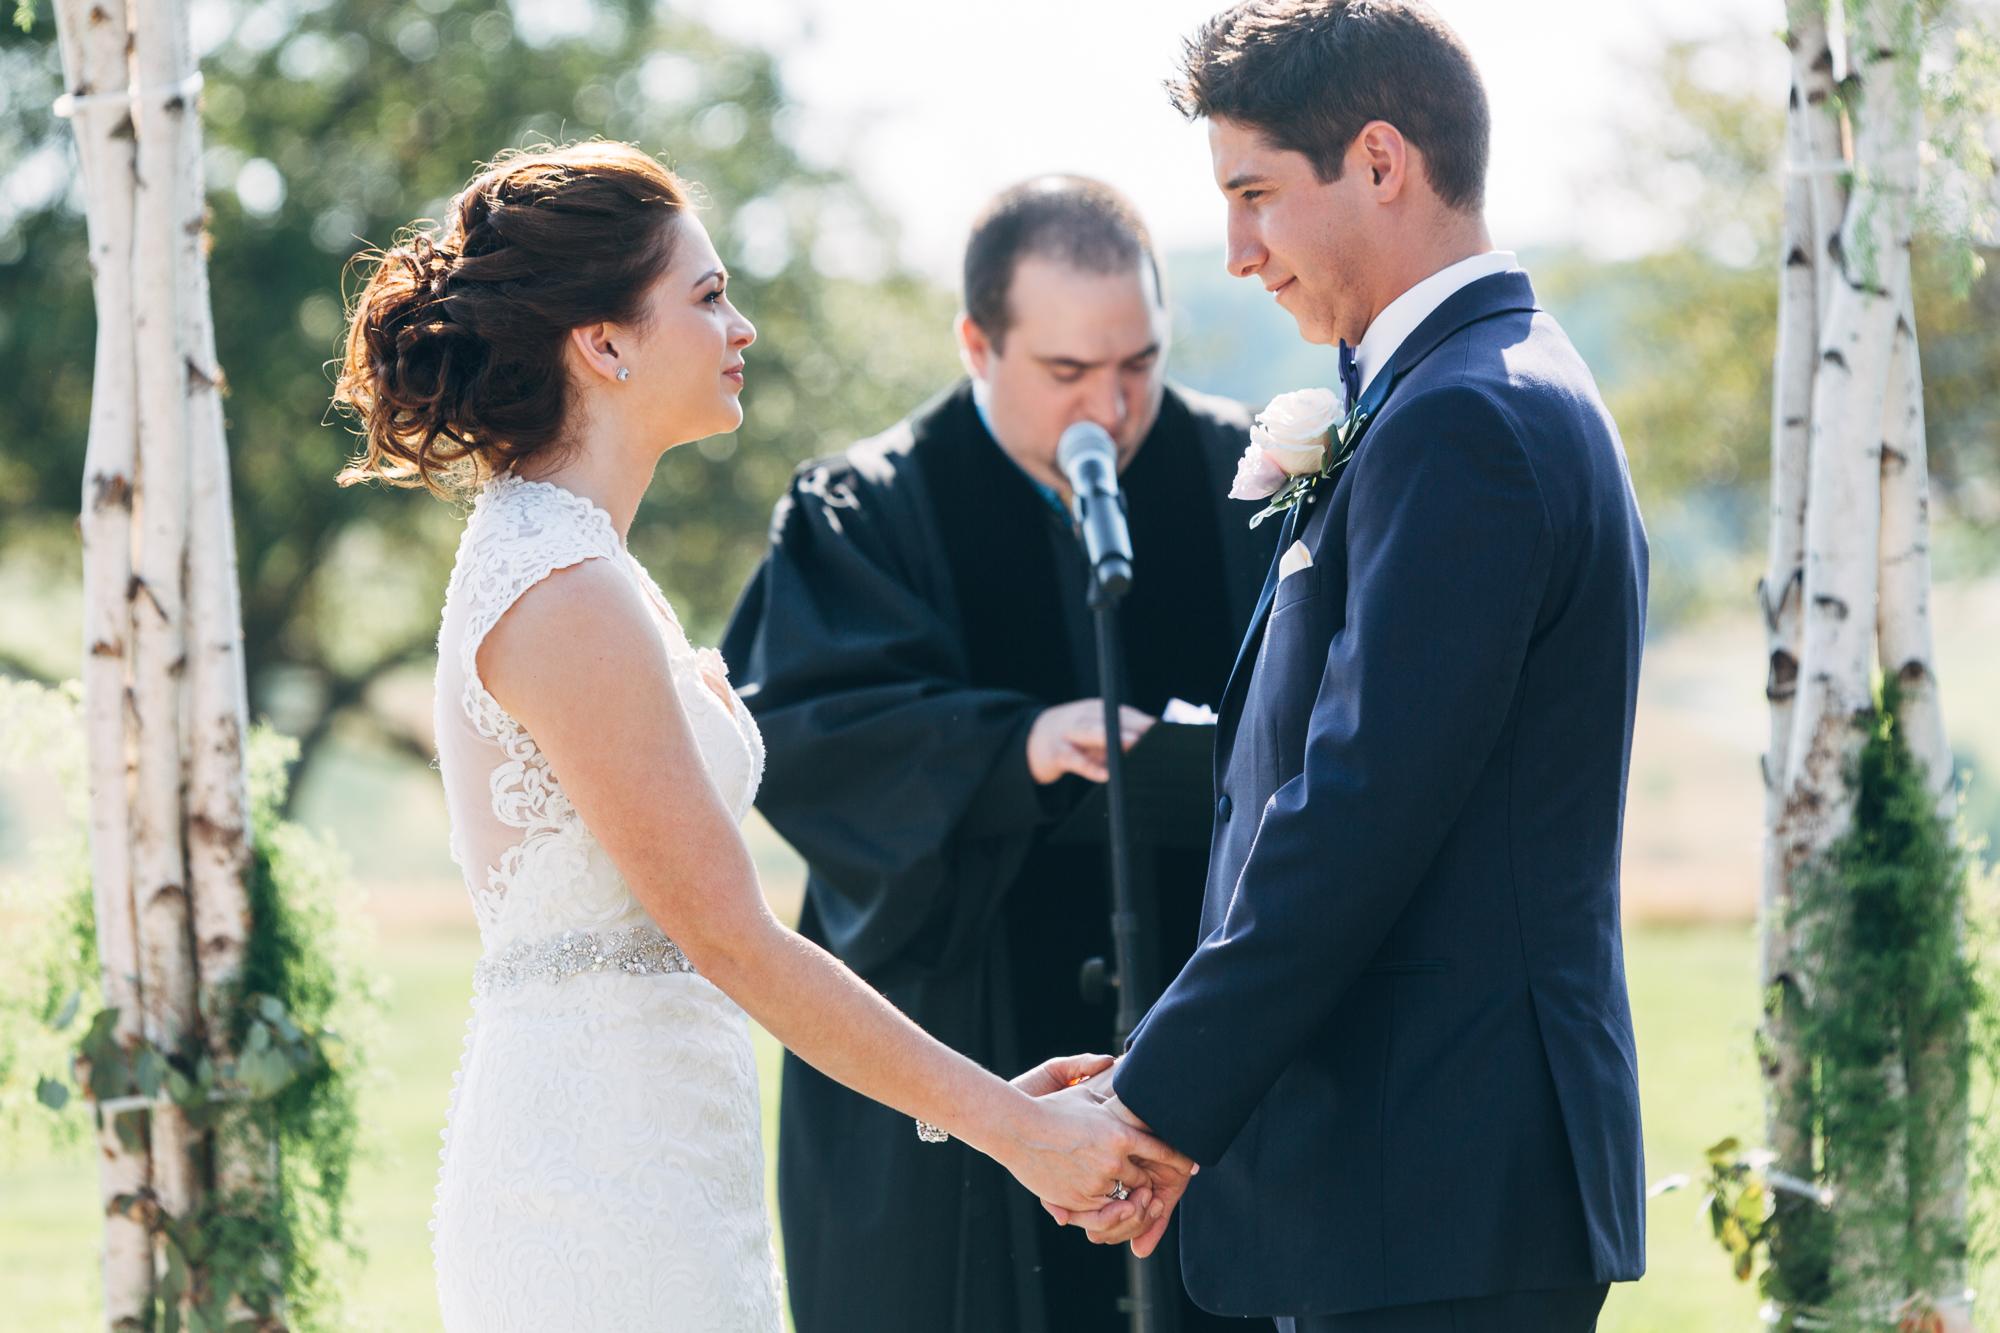 scranton-wedding-photography-zak-zavada-2016.06-rebeccaIan-1262.jpg